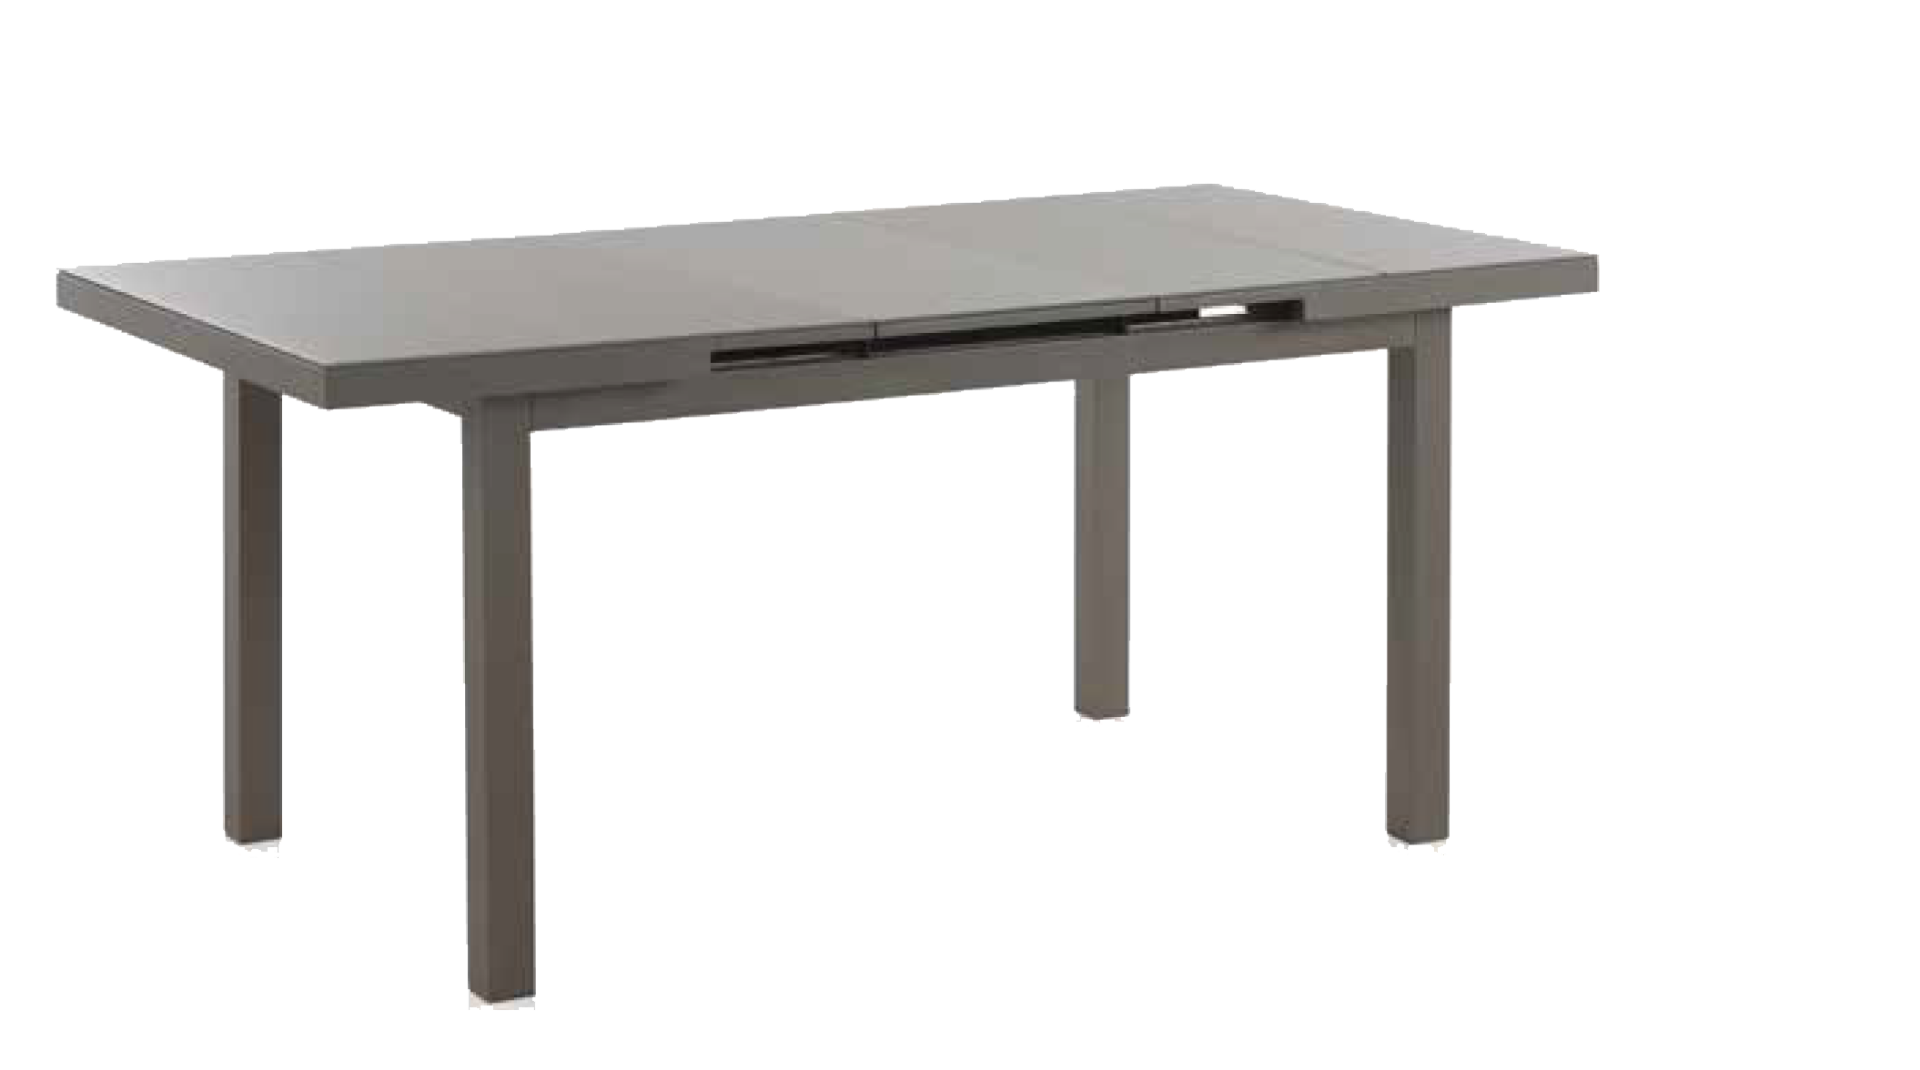 Mesa extensible para jard n o terraza muebles moya tienda online - Mesa blanca extensible ...